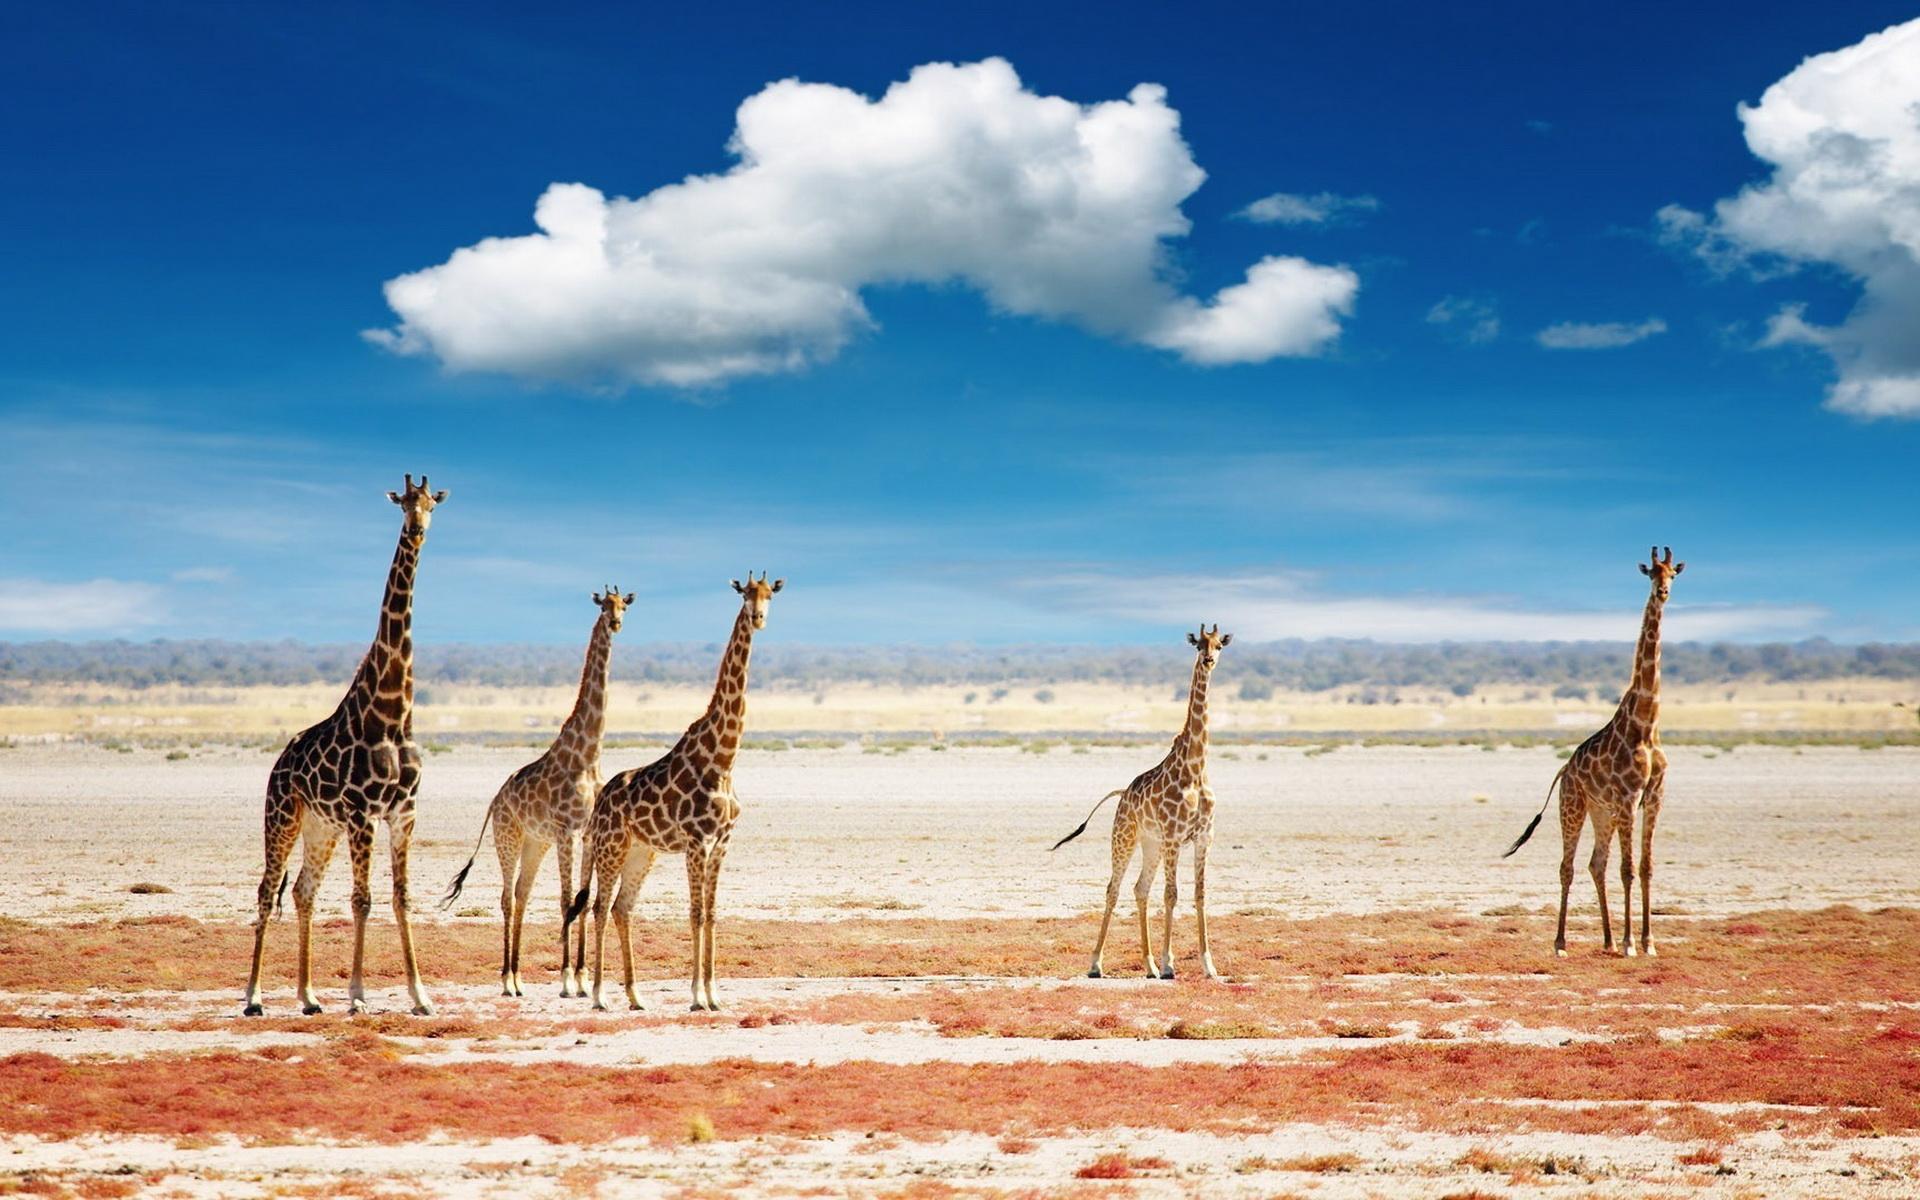 Pin by Vanessa Patterson on Animals Pinterest Giraffe and Animal